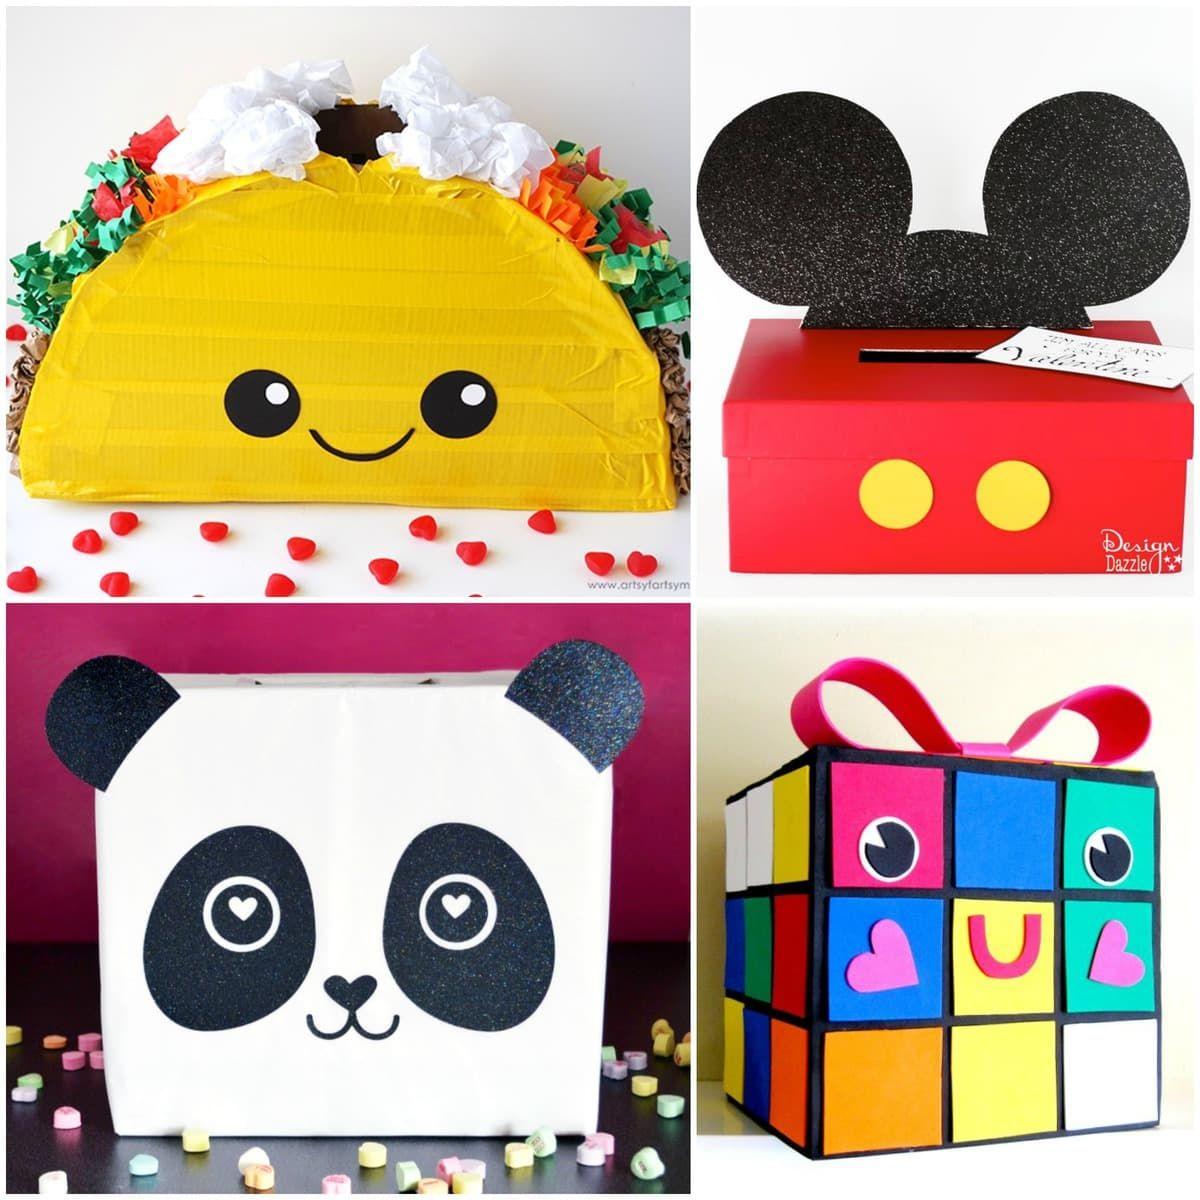 Valentines Box Ideas - Step-by-Step Unicorn, Robot & More! | Lil' Luna